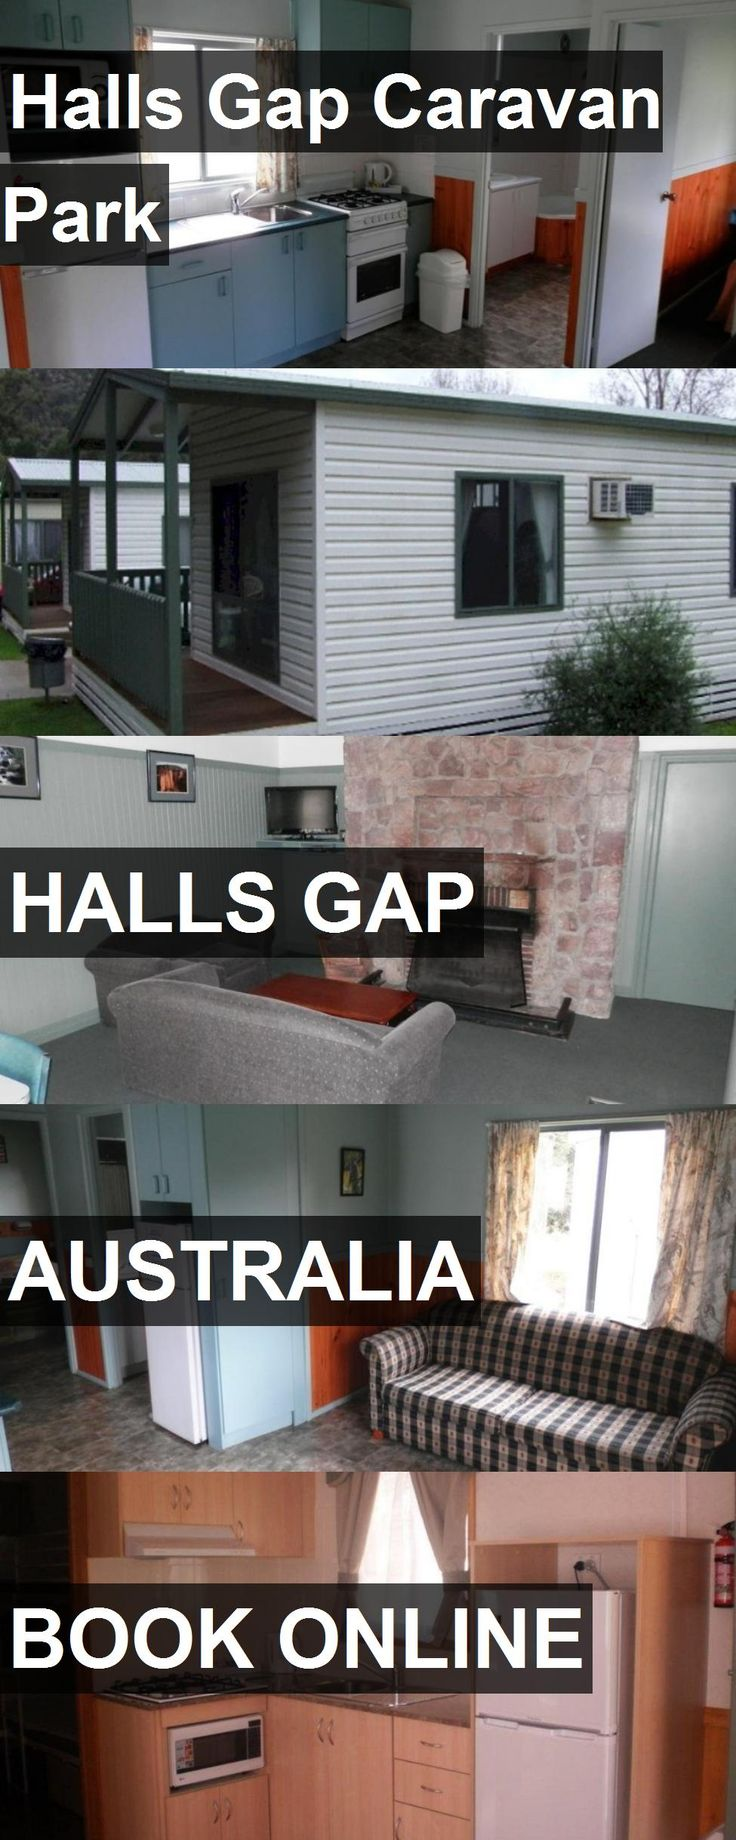 Hotel Halls Gap Caravan Park in Halls Gap, Australia. For more information, photos, reviews and best prices please follow the link. #Australia #HallsGap #travel #vacation #hotel